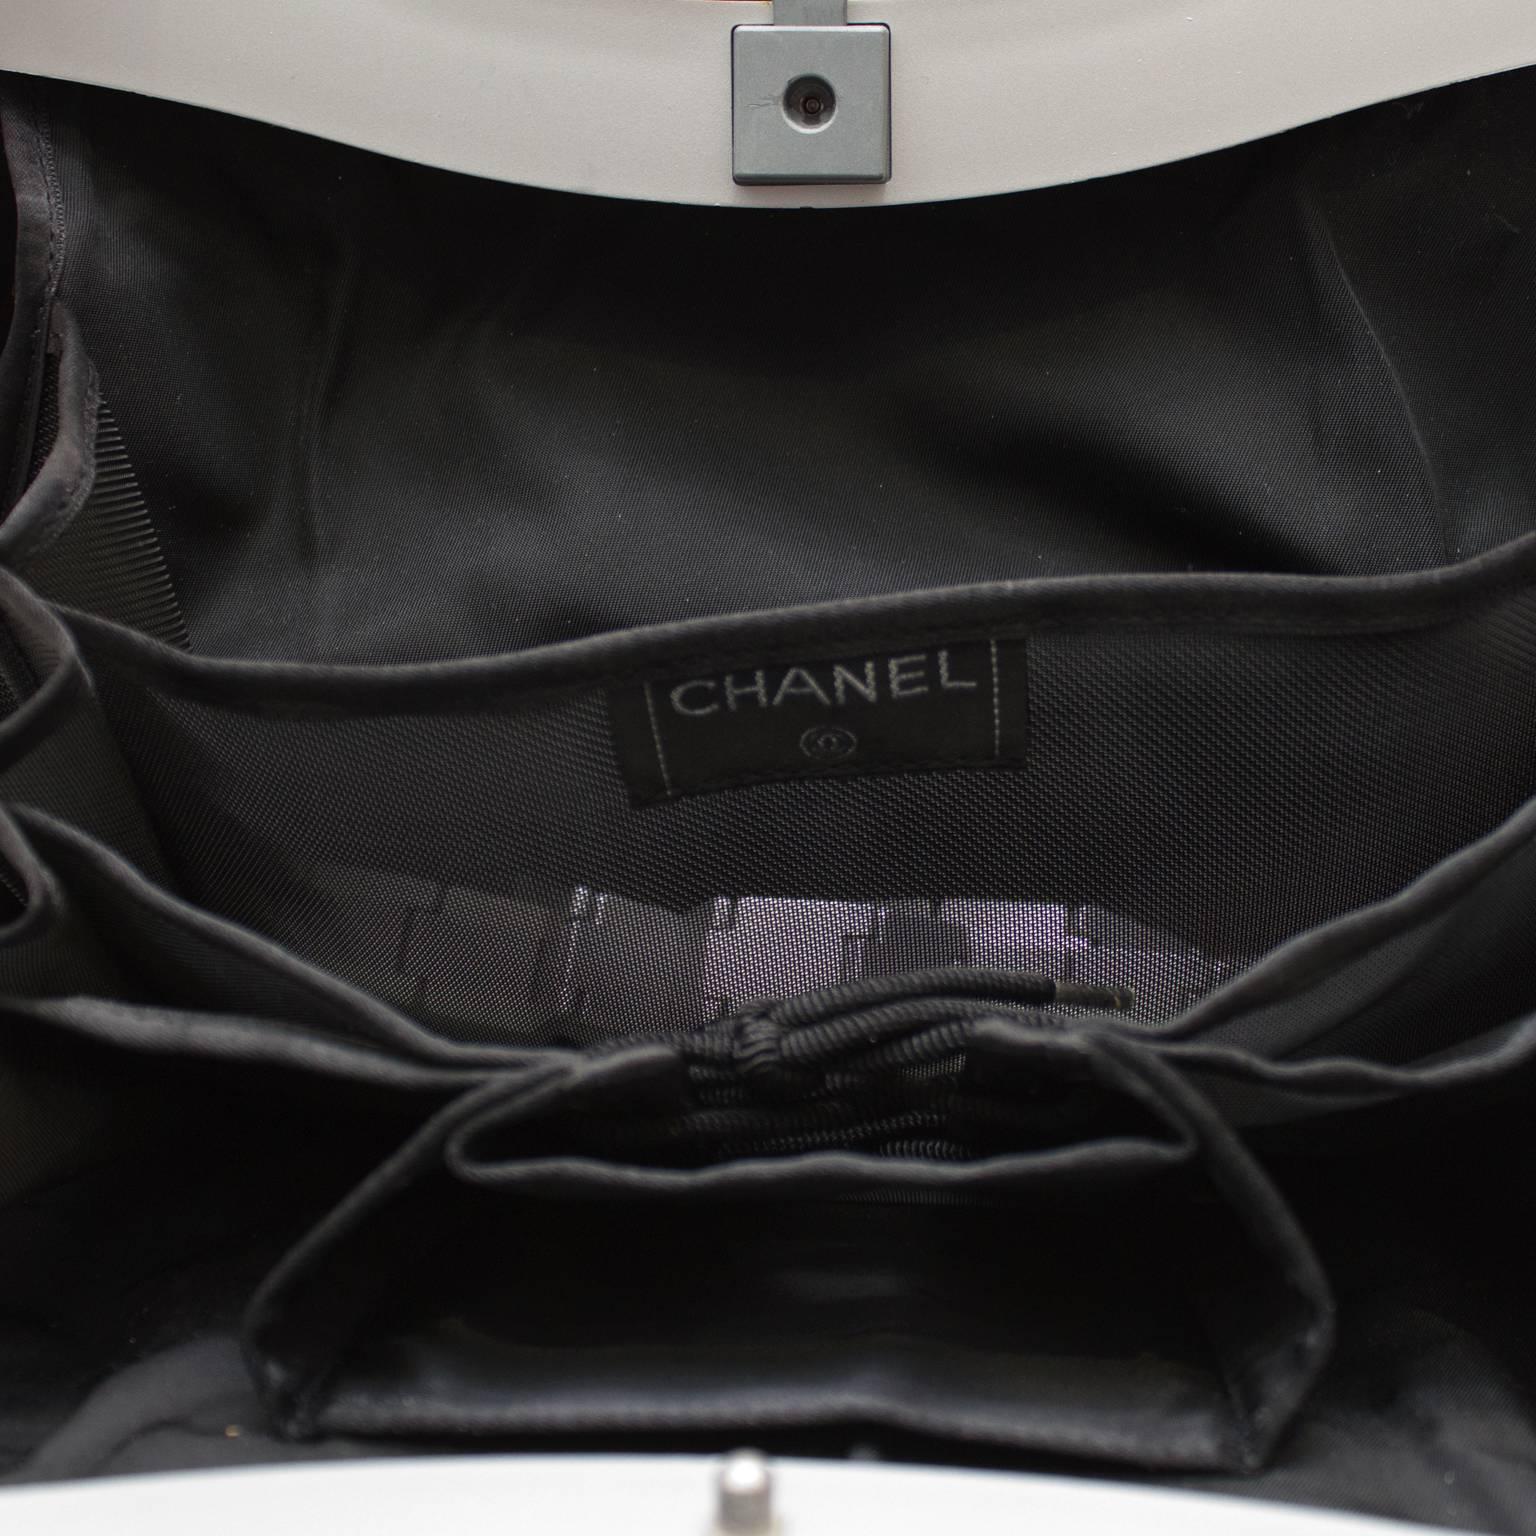 920f89c65347 2005 Chanel Premier Edition Futuristic Hard Shell Handbag at 1stdibs